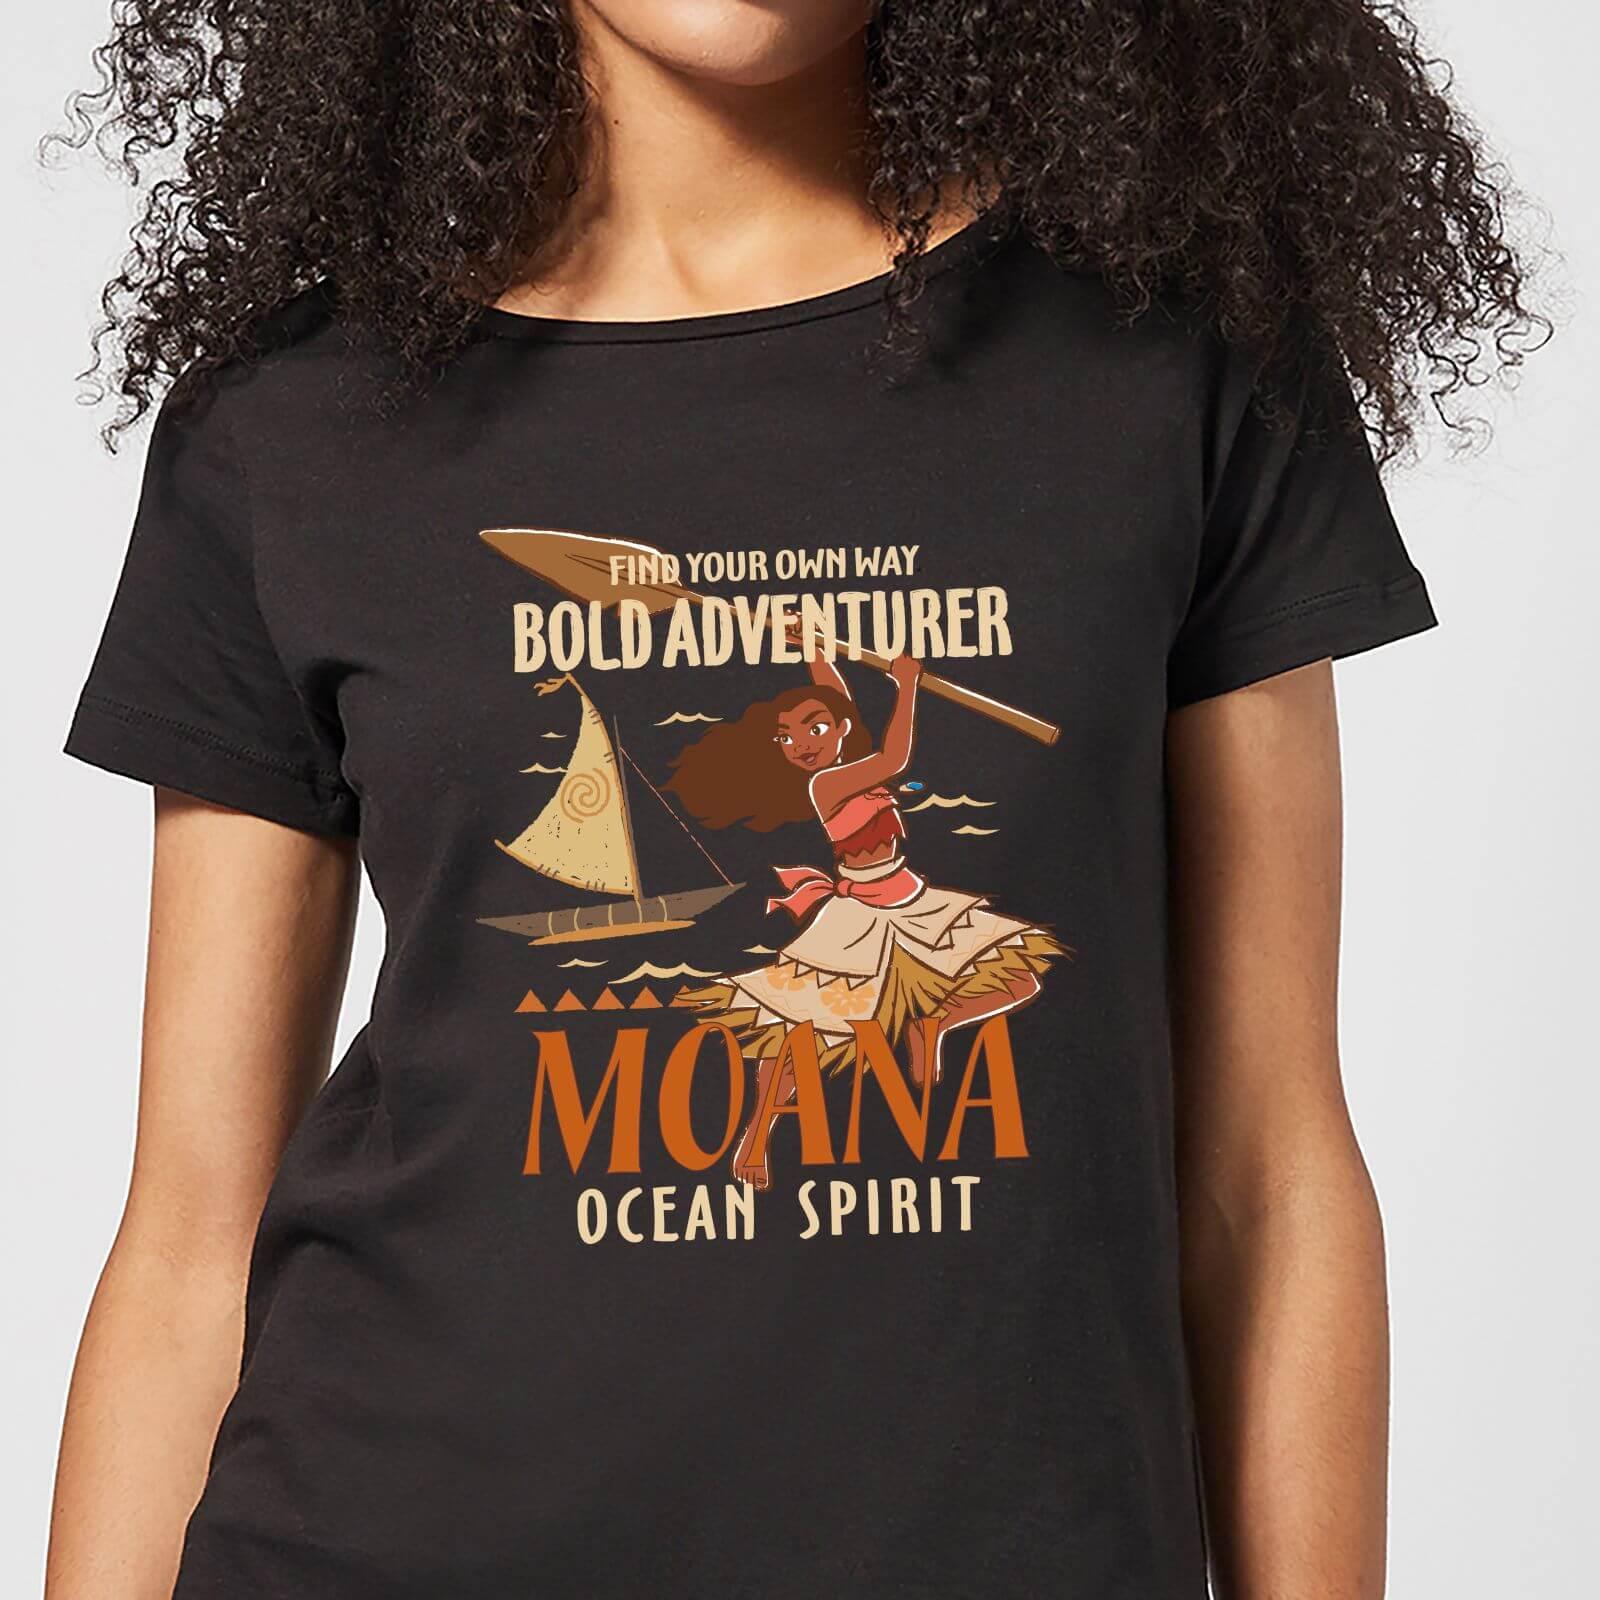 Disney Moana Find Your Own Way Women's T-Shirt - Black - 5XL - Black